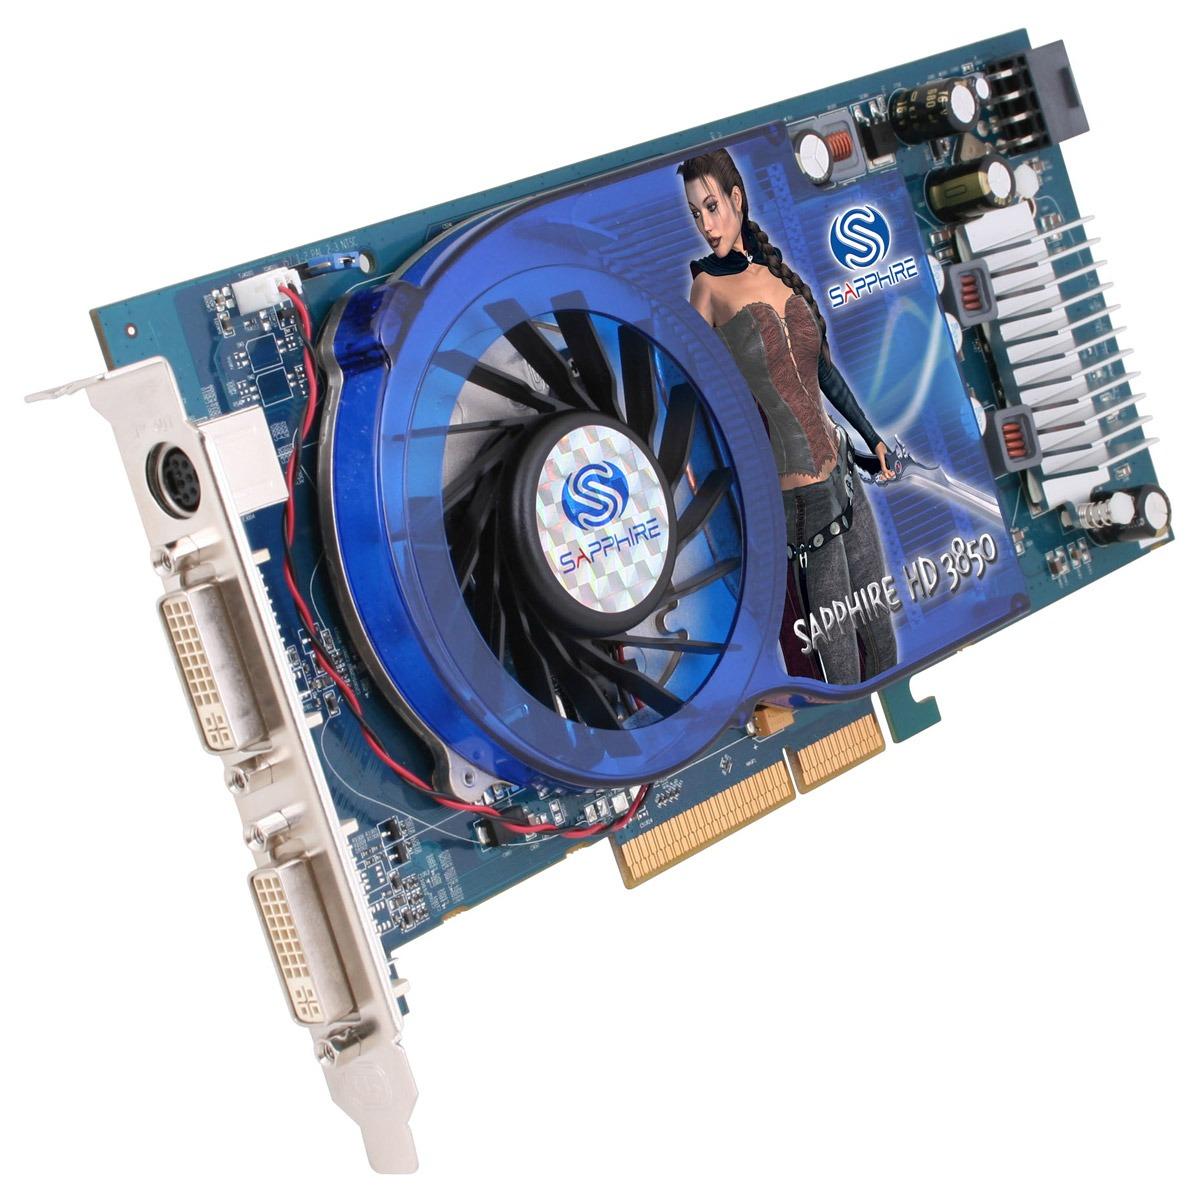 Carte graphique Sapphire Radeon HD 3850 512 MB Sapphire Radeon HD 3850 - 512 Mo TV-Out/Dual DVI - AGP (ATI Radeon HD 3850)